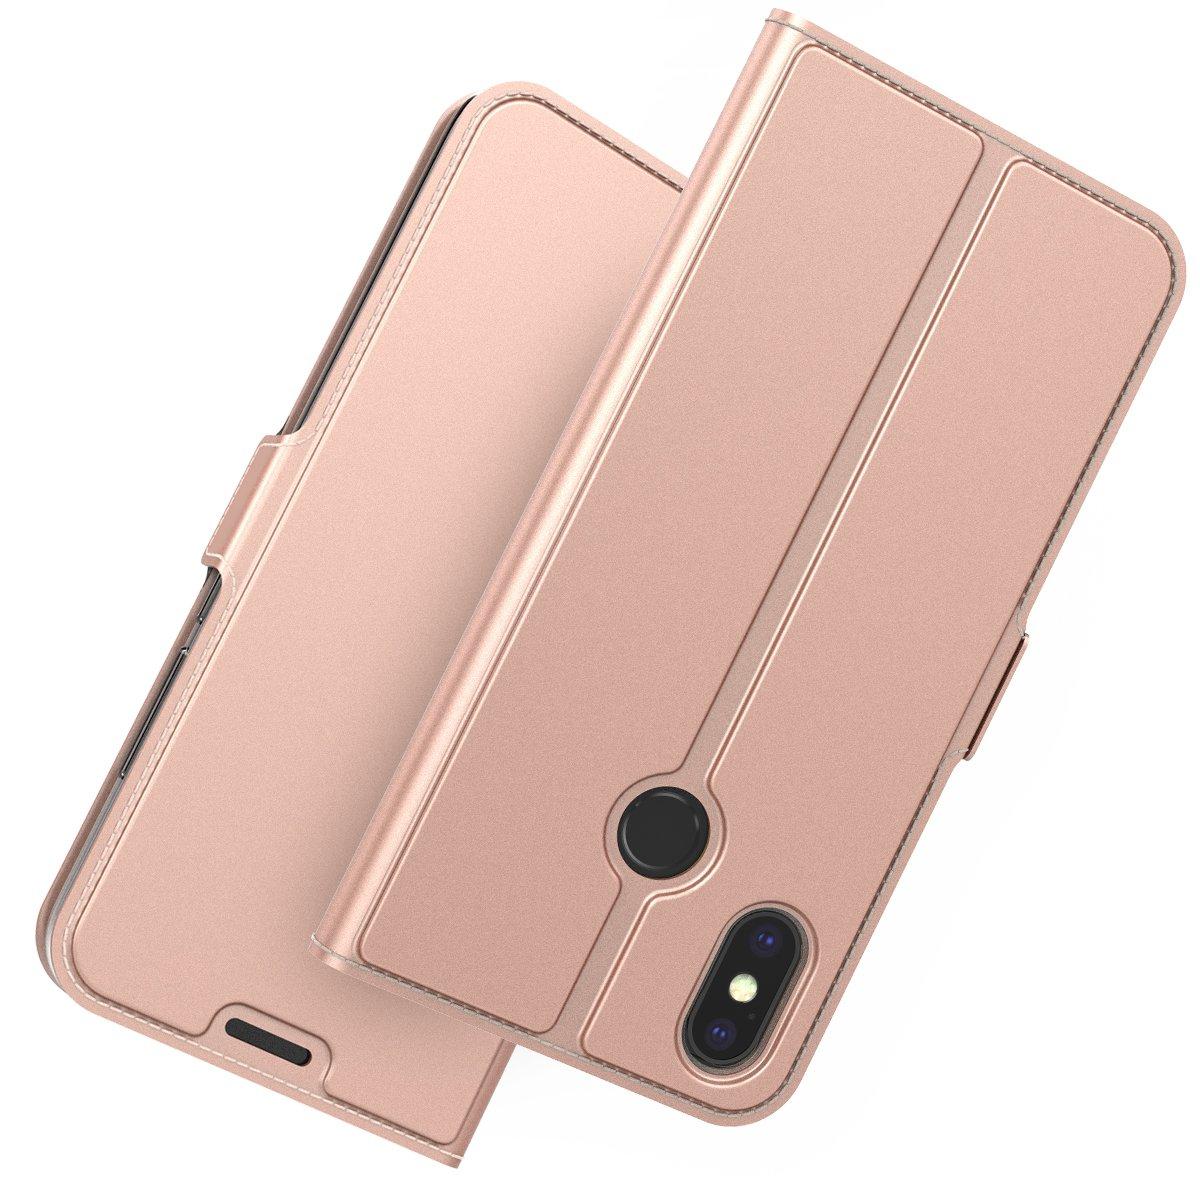 TOTOOSE Xiaomi Mi 8 Wallet Case Golden Premium Leather Zipper Wallet Multifunctional Boys Removable Card Slot Pocket Pouch Flip Protective Cover for Xiaomi Mi 8 Xiaomi Mi 8 Case